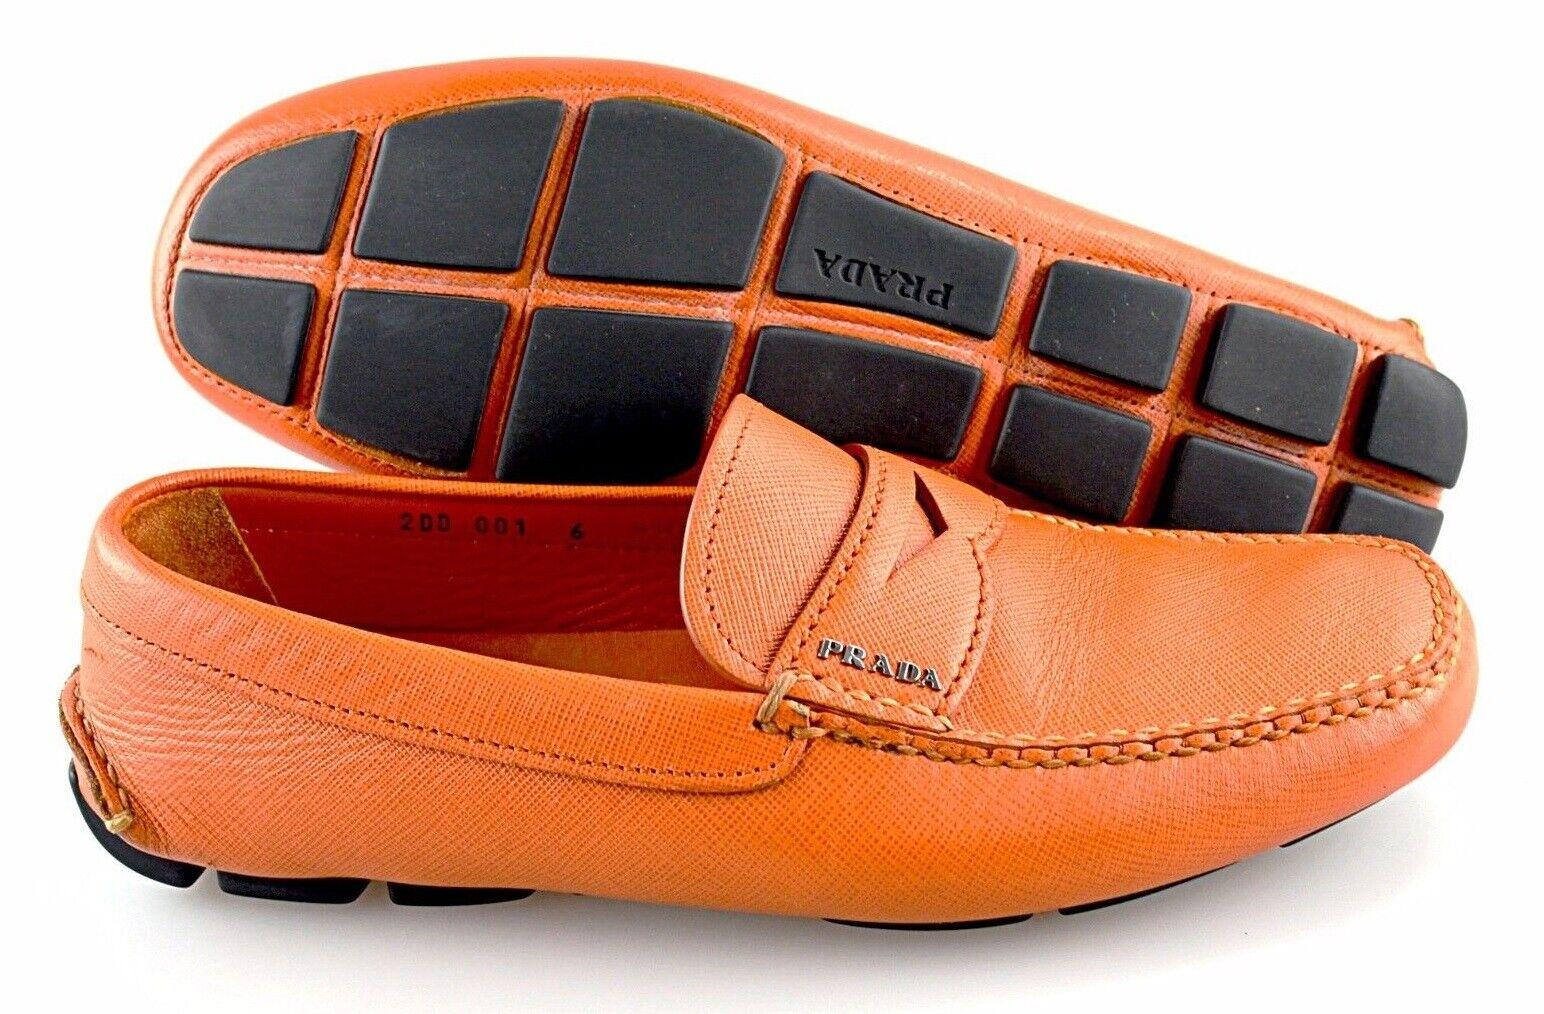 Men's PRADA 'Saffiano' orange Leather Loafers Size US 7 PRADA 6